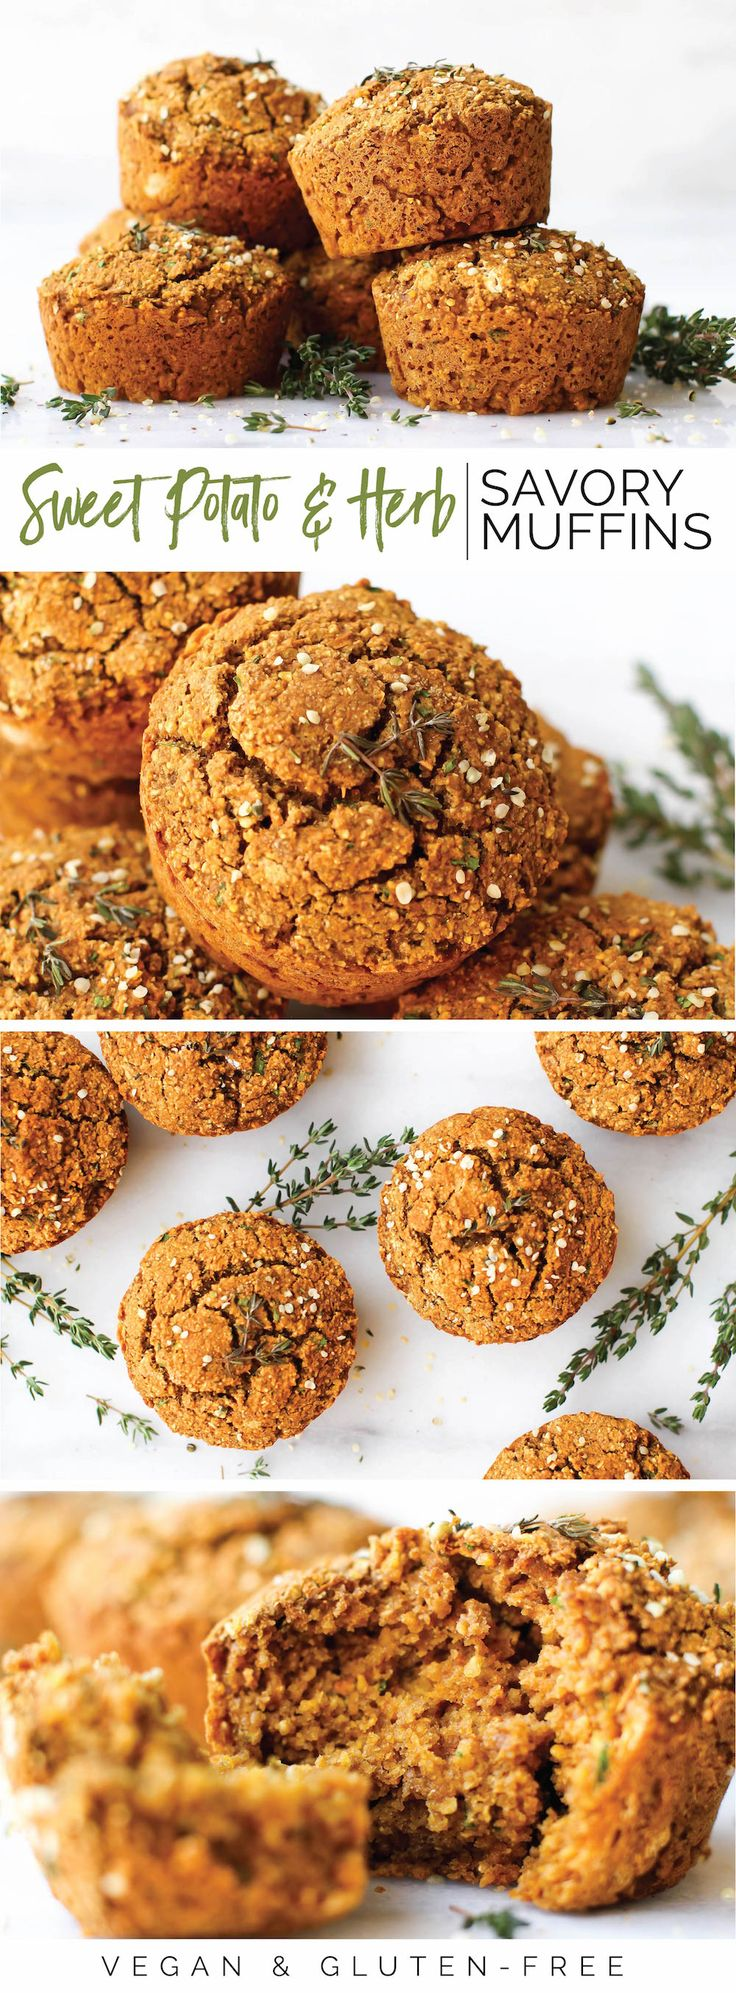 Sweet Potato & Herb Savory Muffins {vegan, gf, oil-free}